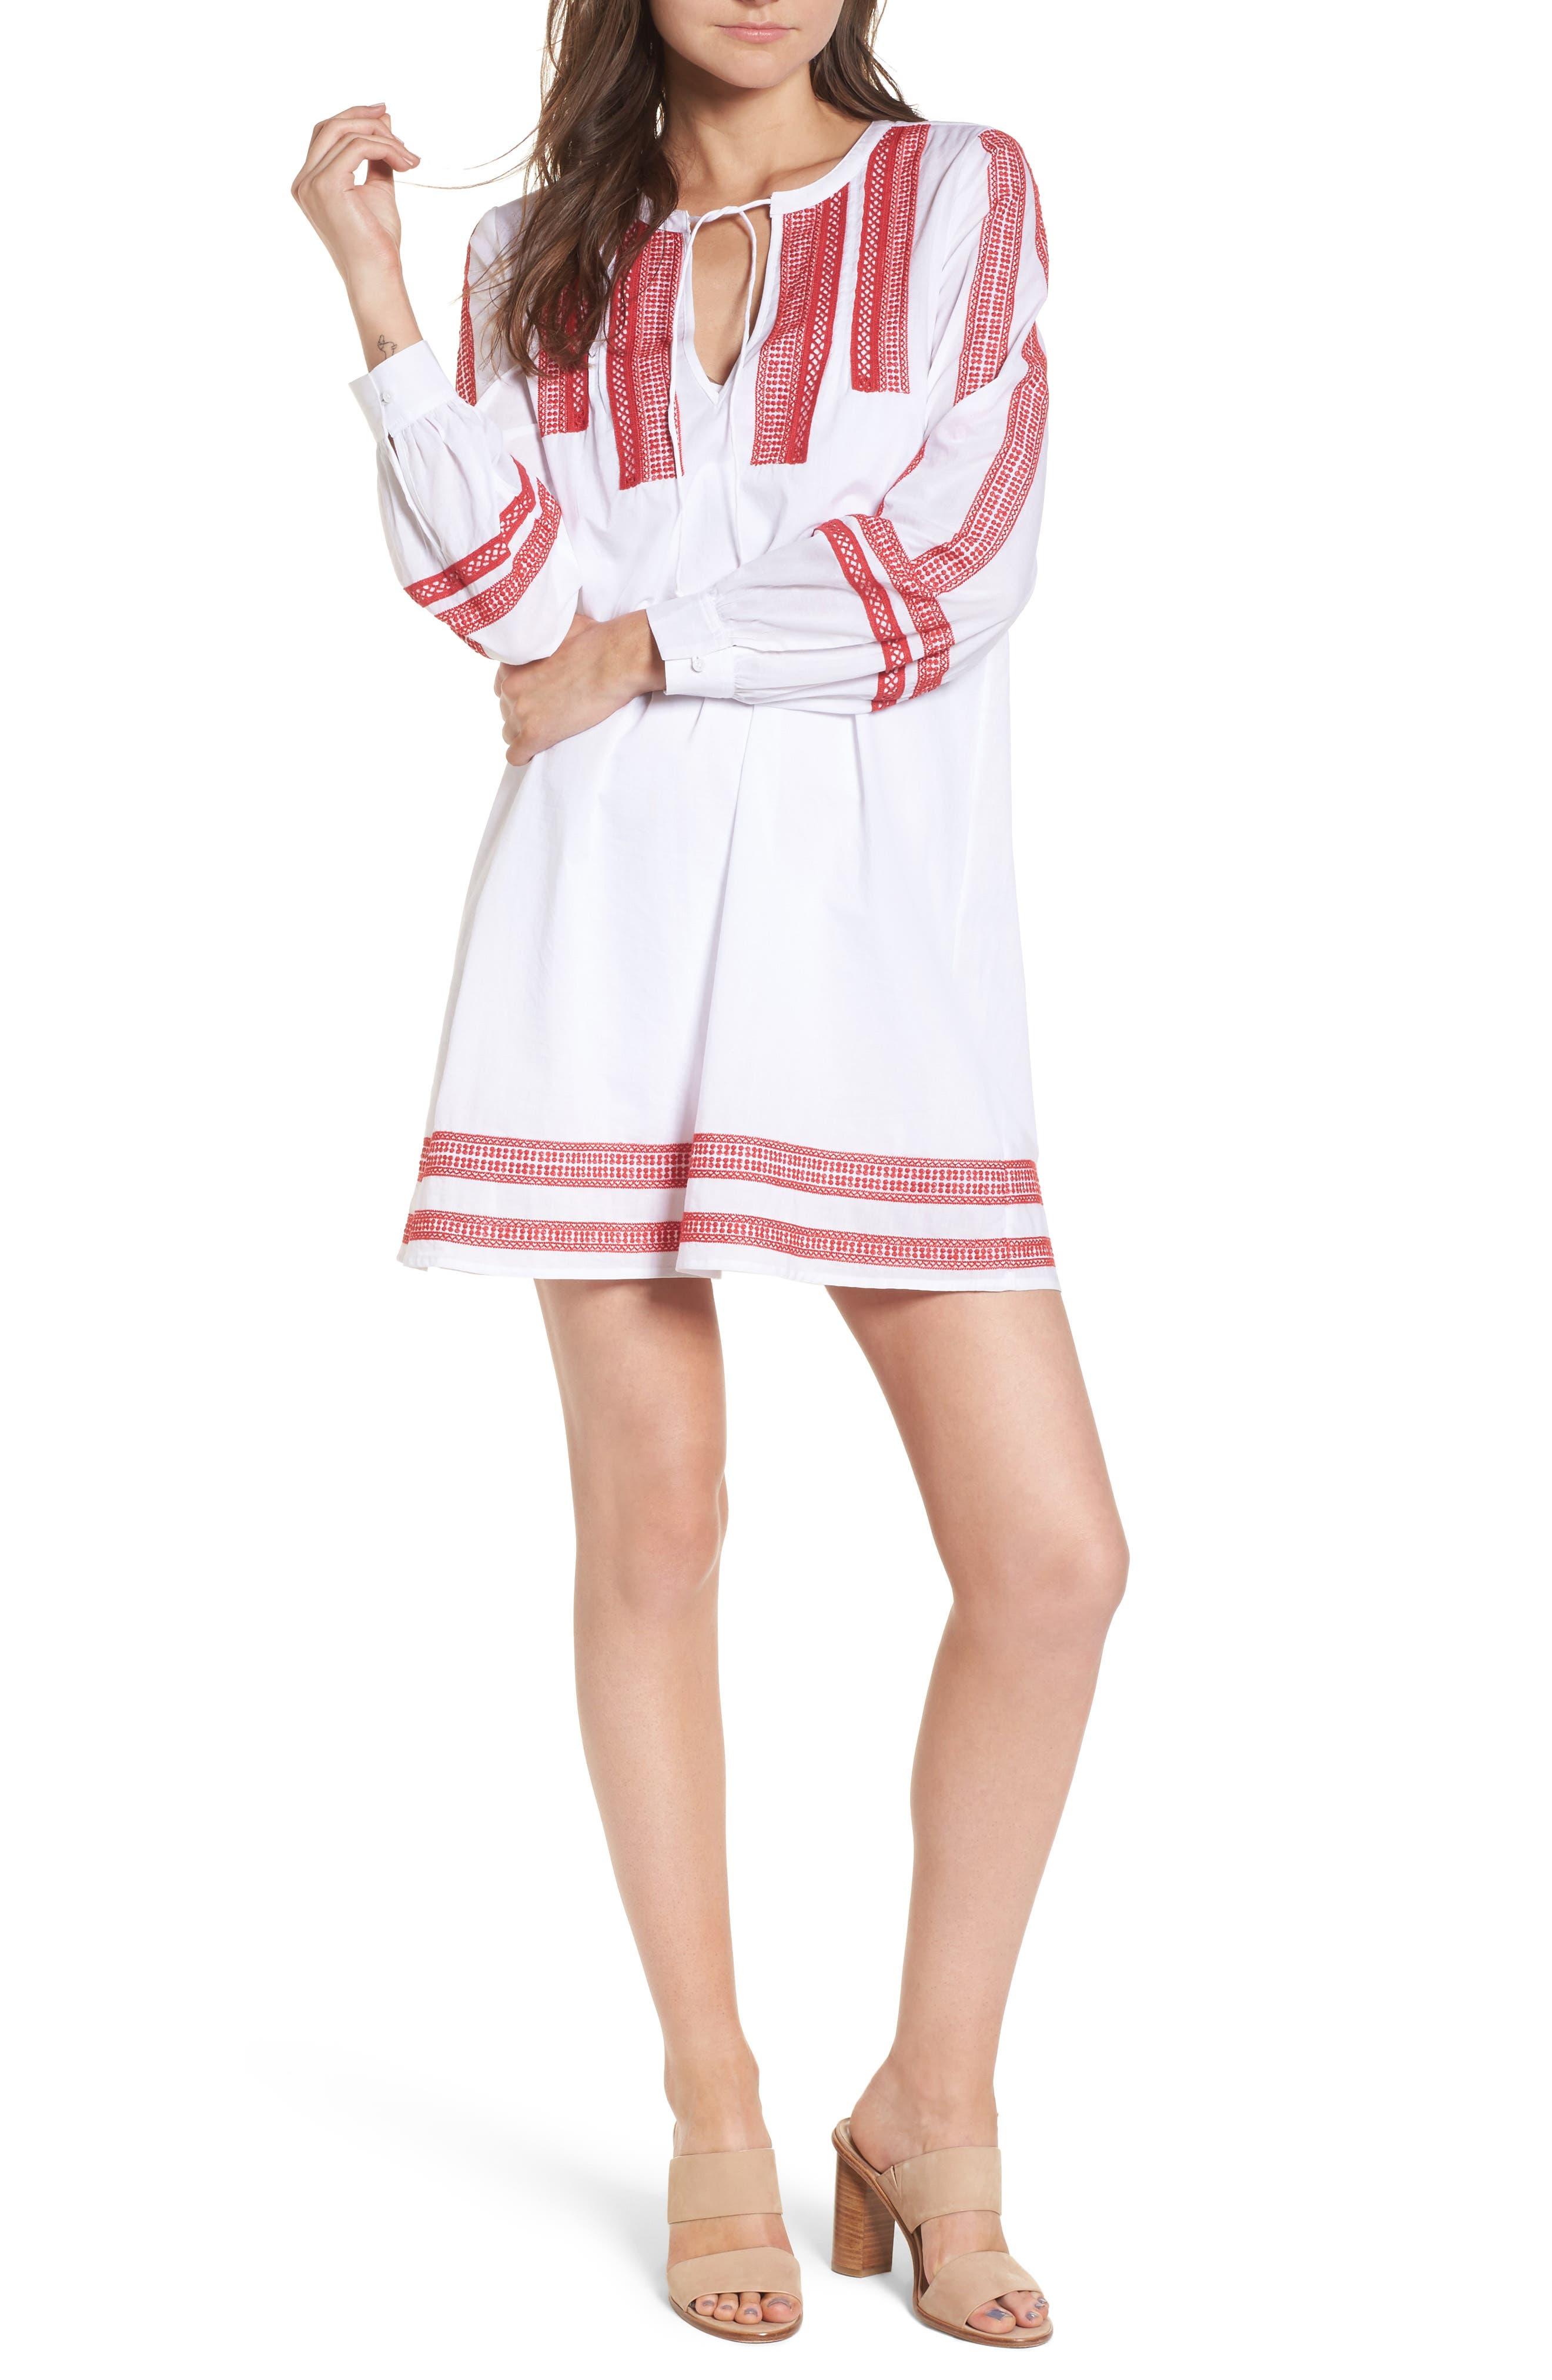 Main Image - Hinge Embroidered Lace Minidress